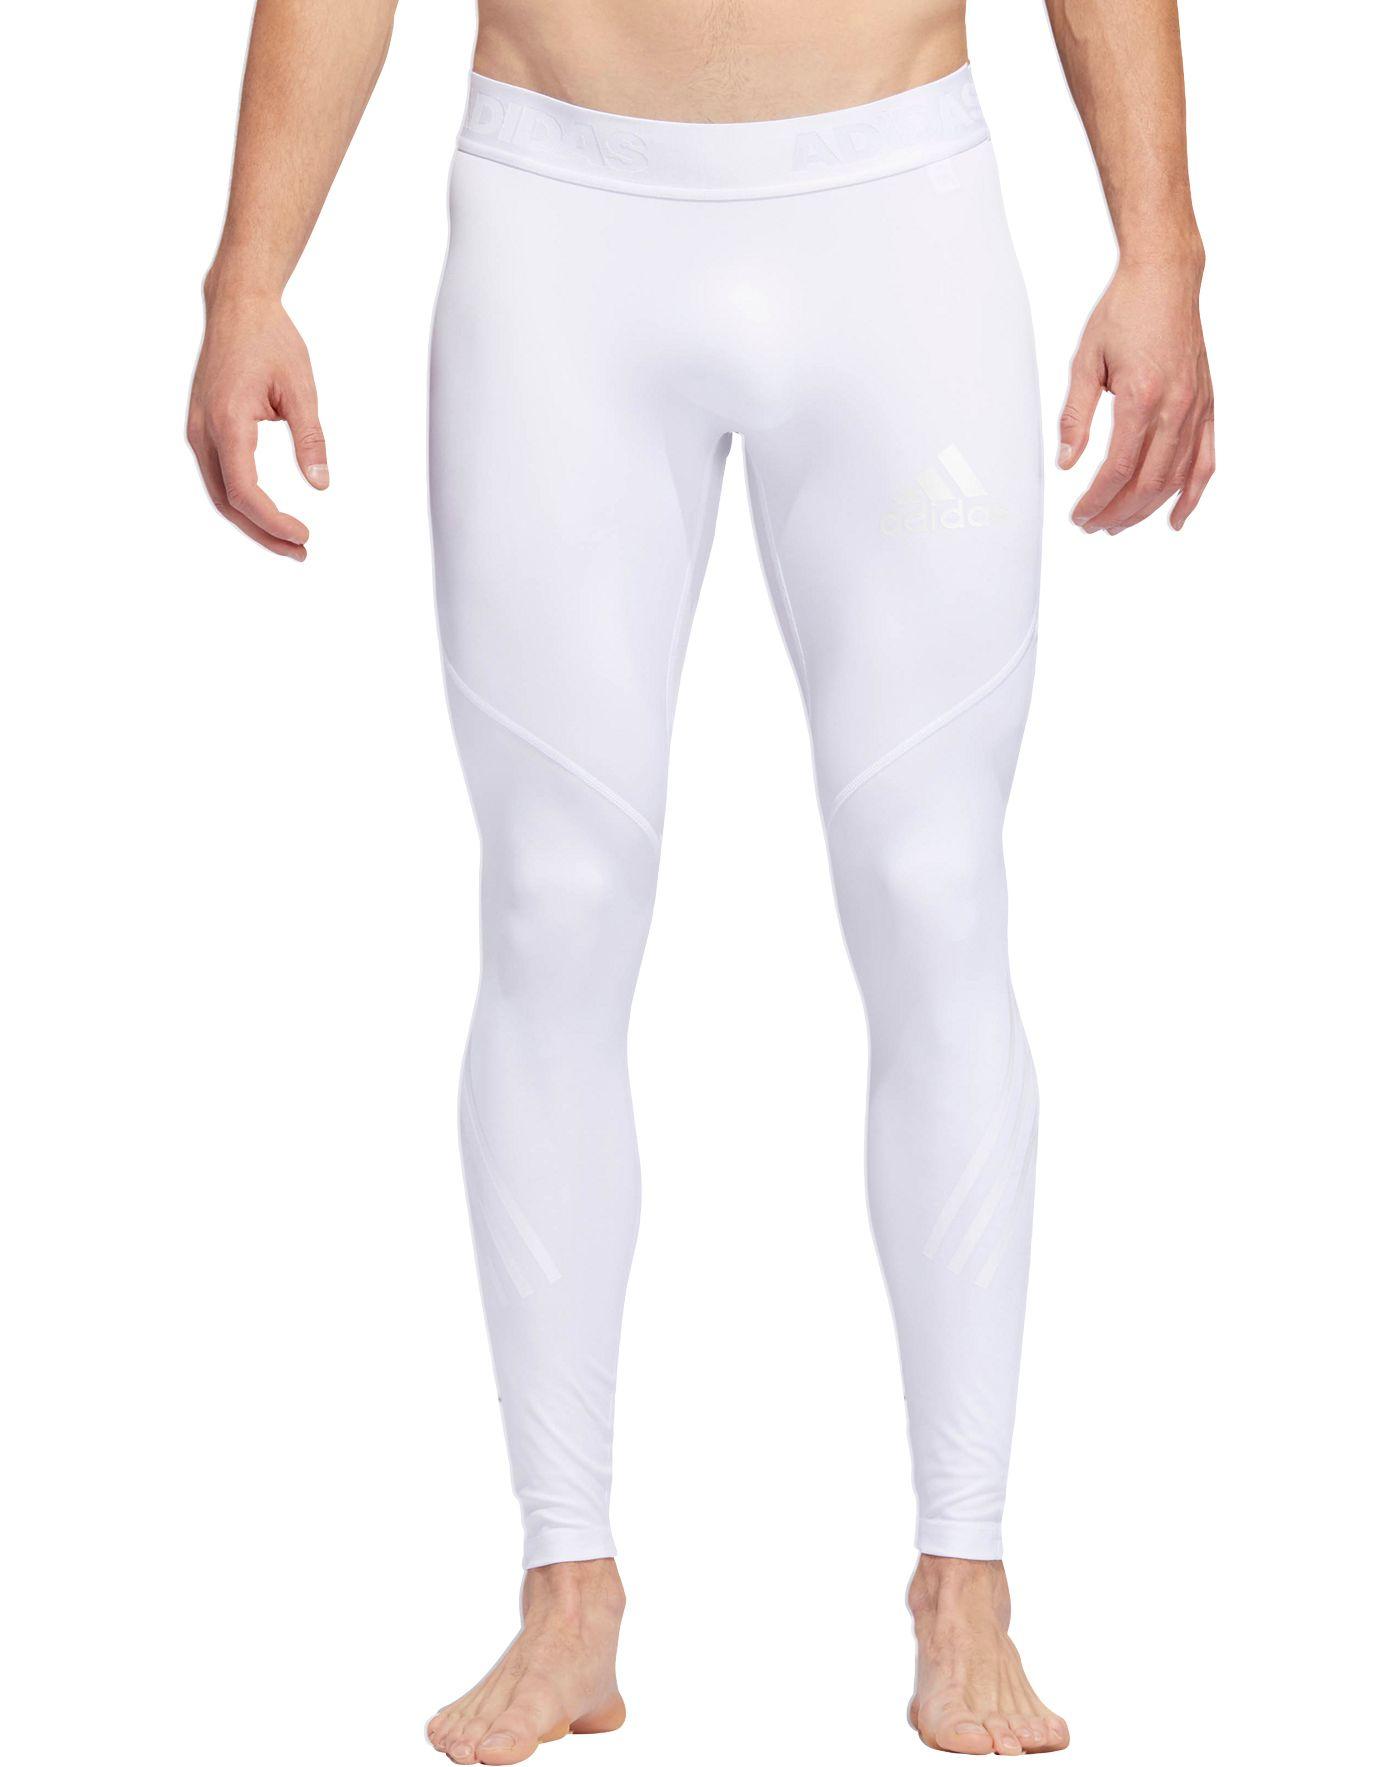 adidas Men's Alphaskin Sport 3-Stripes Tights